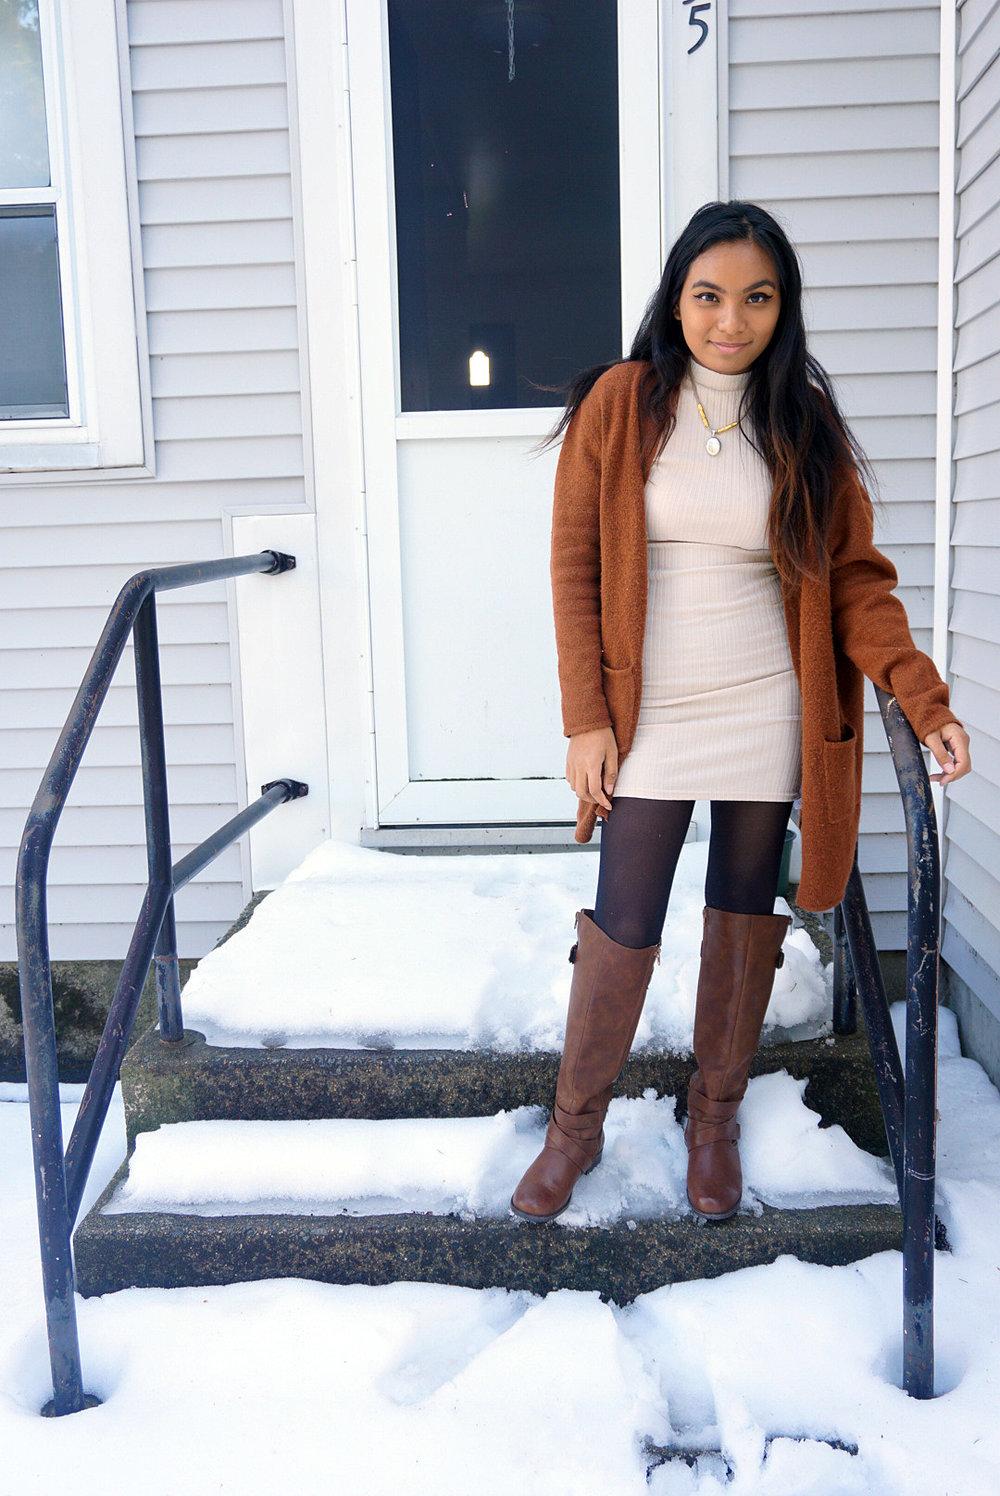 White-Dress-Caramel-Cardigan-Transitioning-To-Spring-Fashionista-Blogger-Style-LINDATENCHITRAN-2-1080x1616.jpg